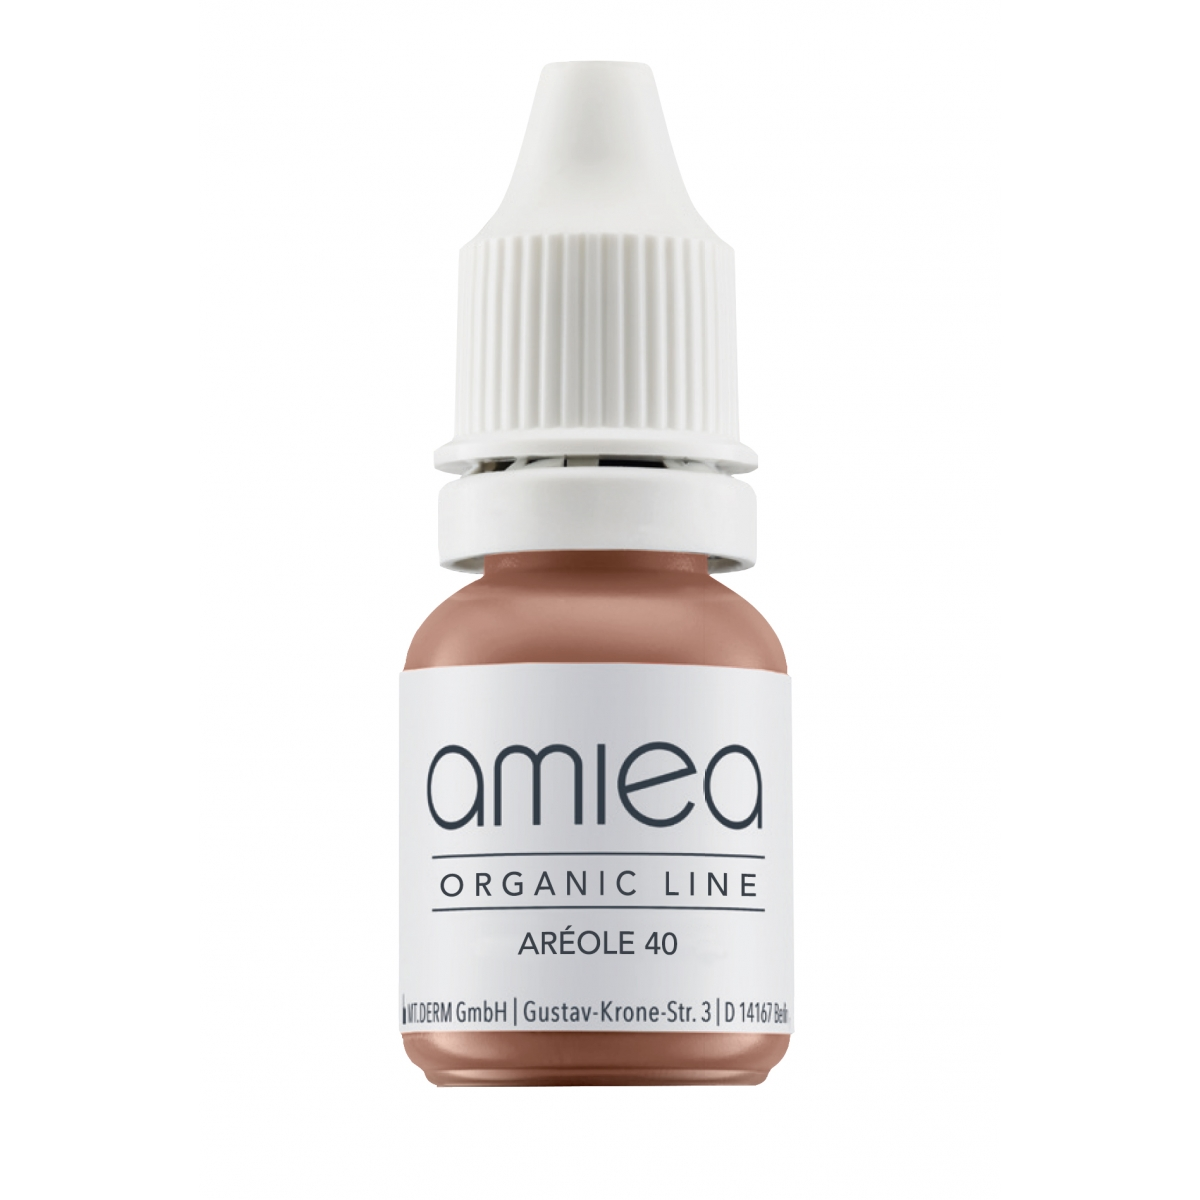 ORGANIC LINE (10ml) - PIGMENT AREOLES 40 ORGANICLINE AMIEA (10 ml)